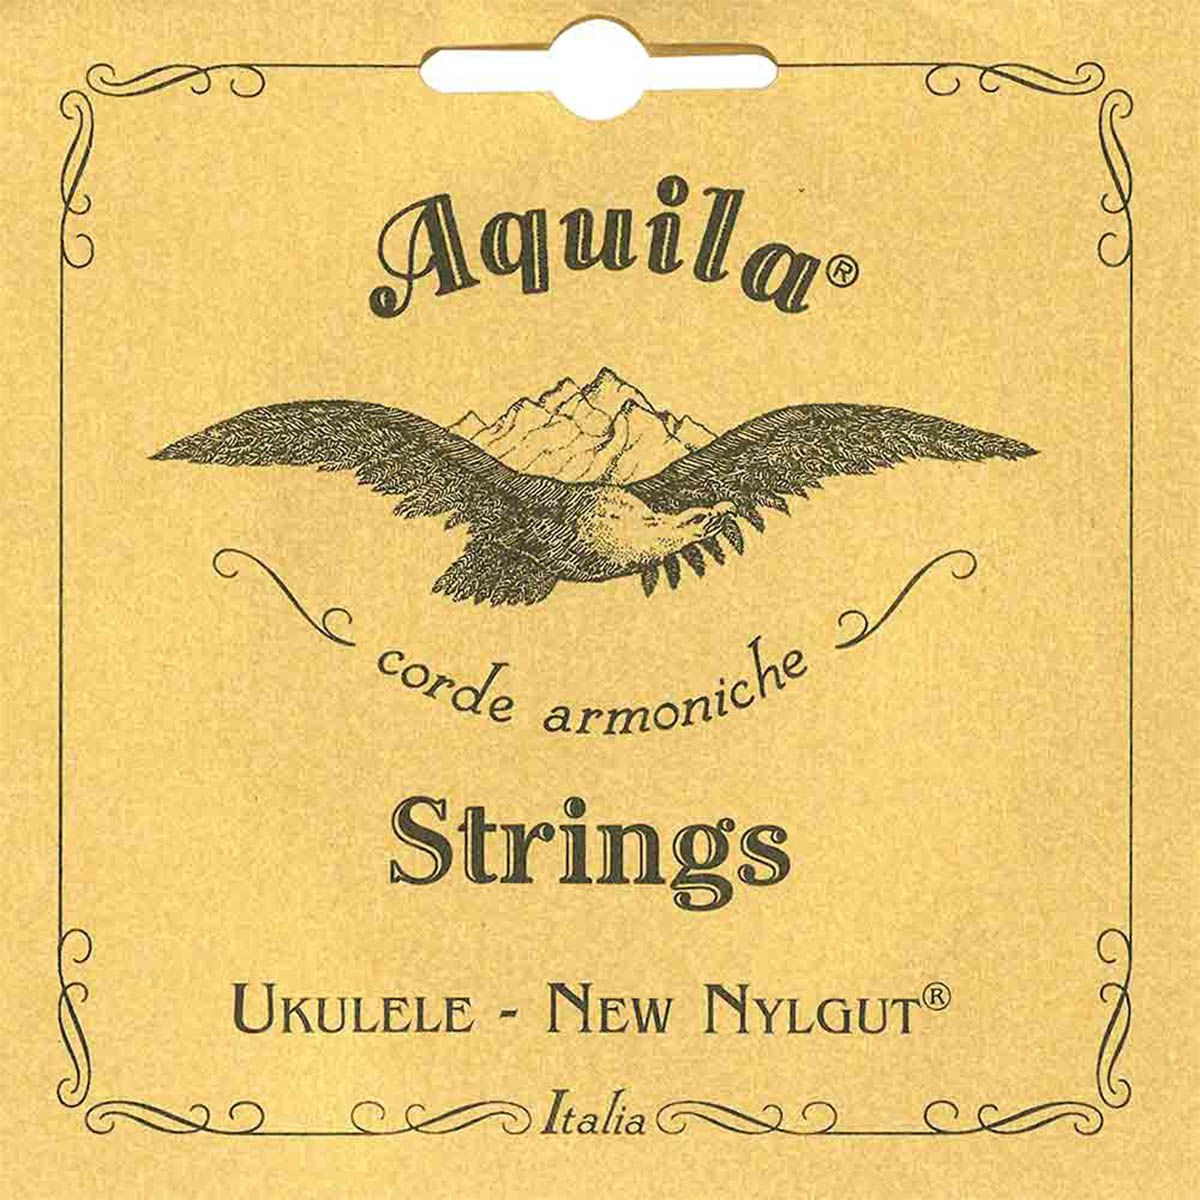 Encordoamento Aquila 7U New Nylgut High G Concert